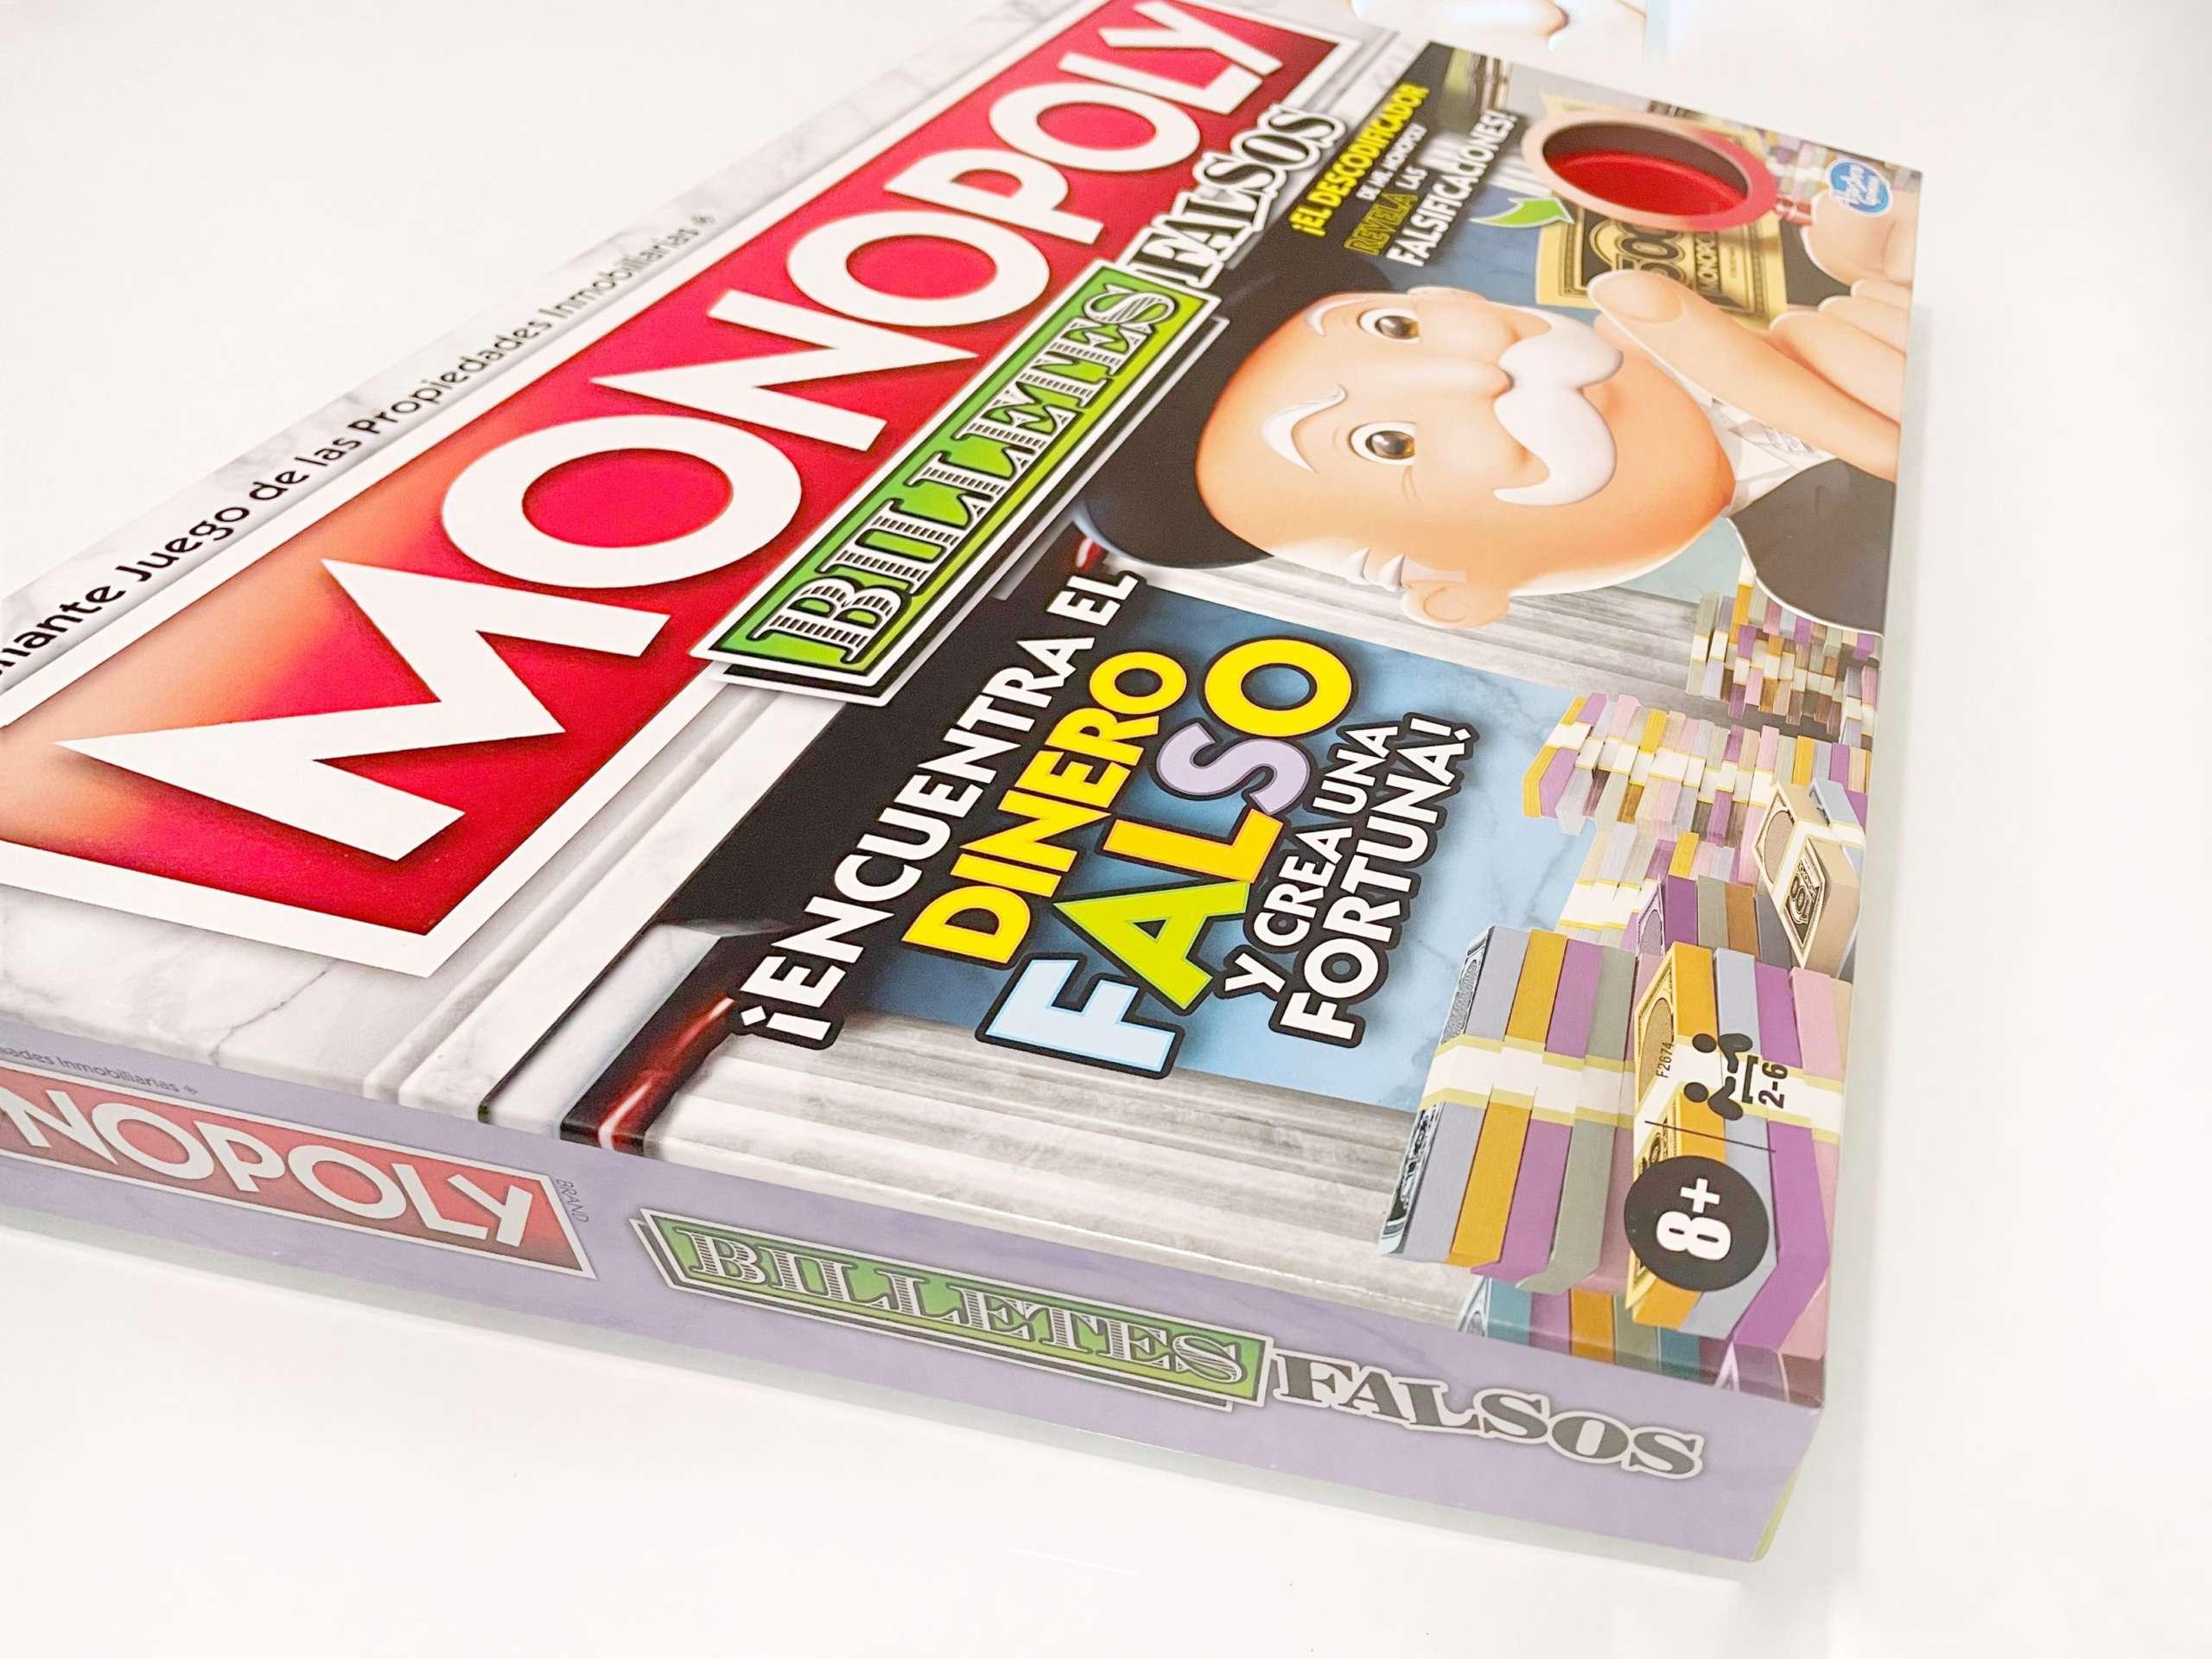 Jugando a Monopoly billetes falsos